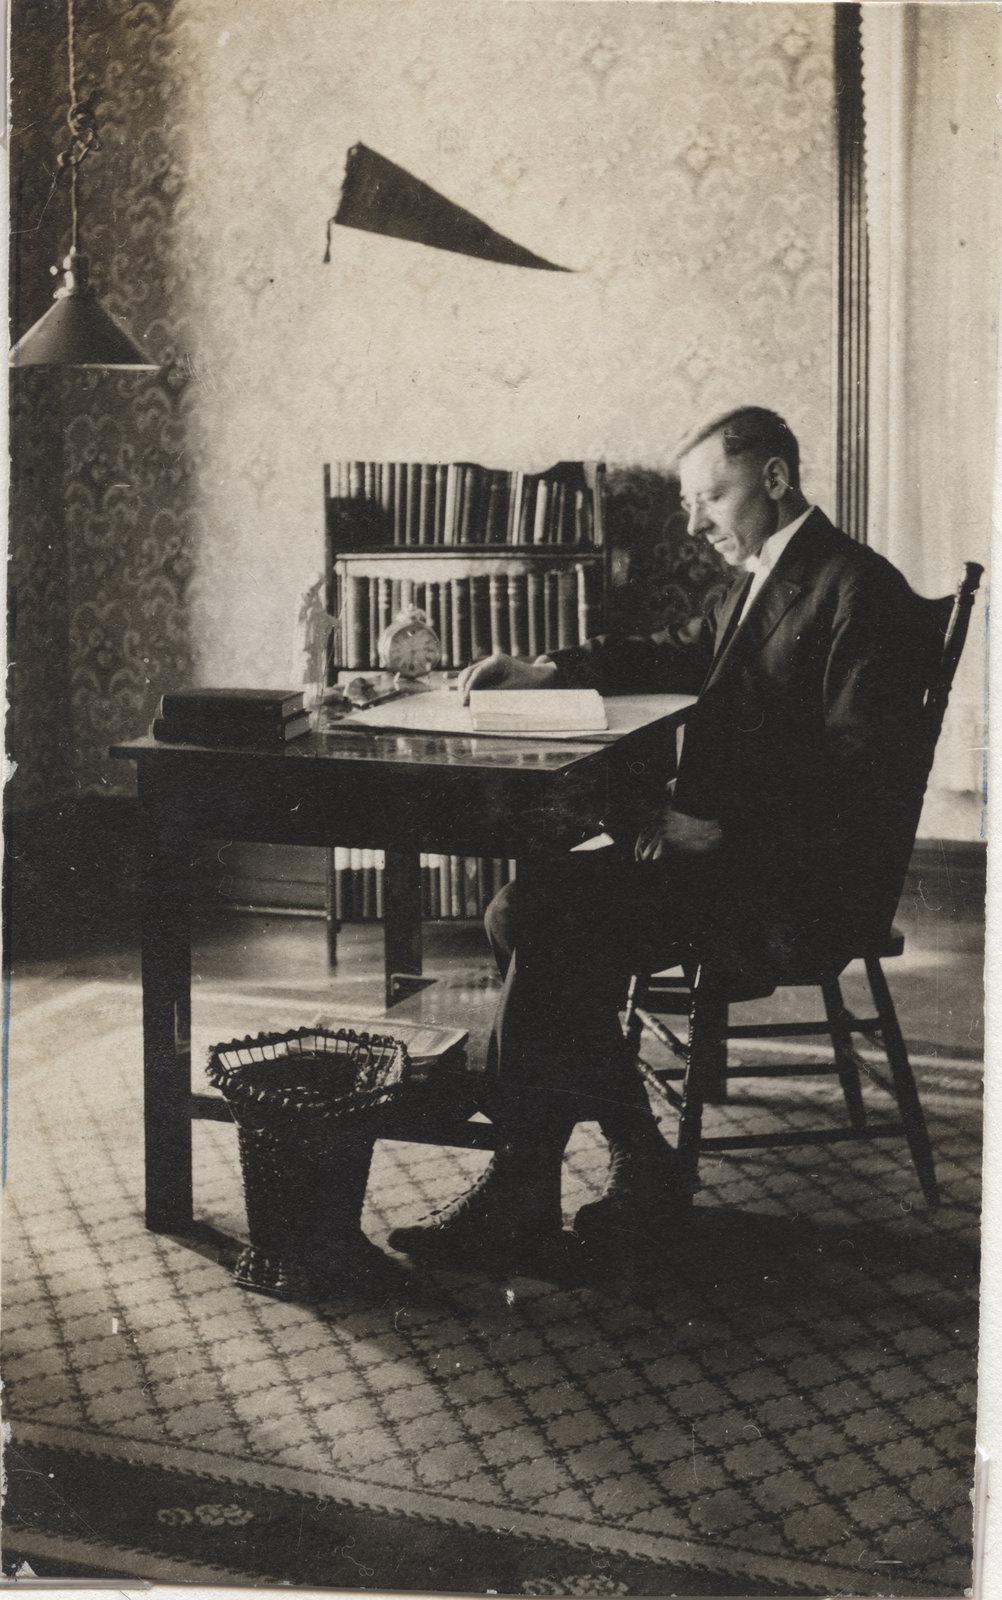 Carl Sorensen, Evangelical Lutheran Seminary of Canada